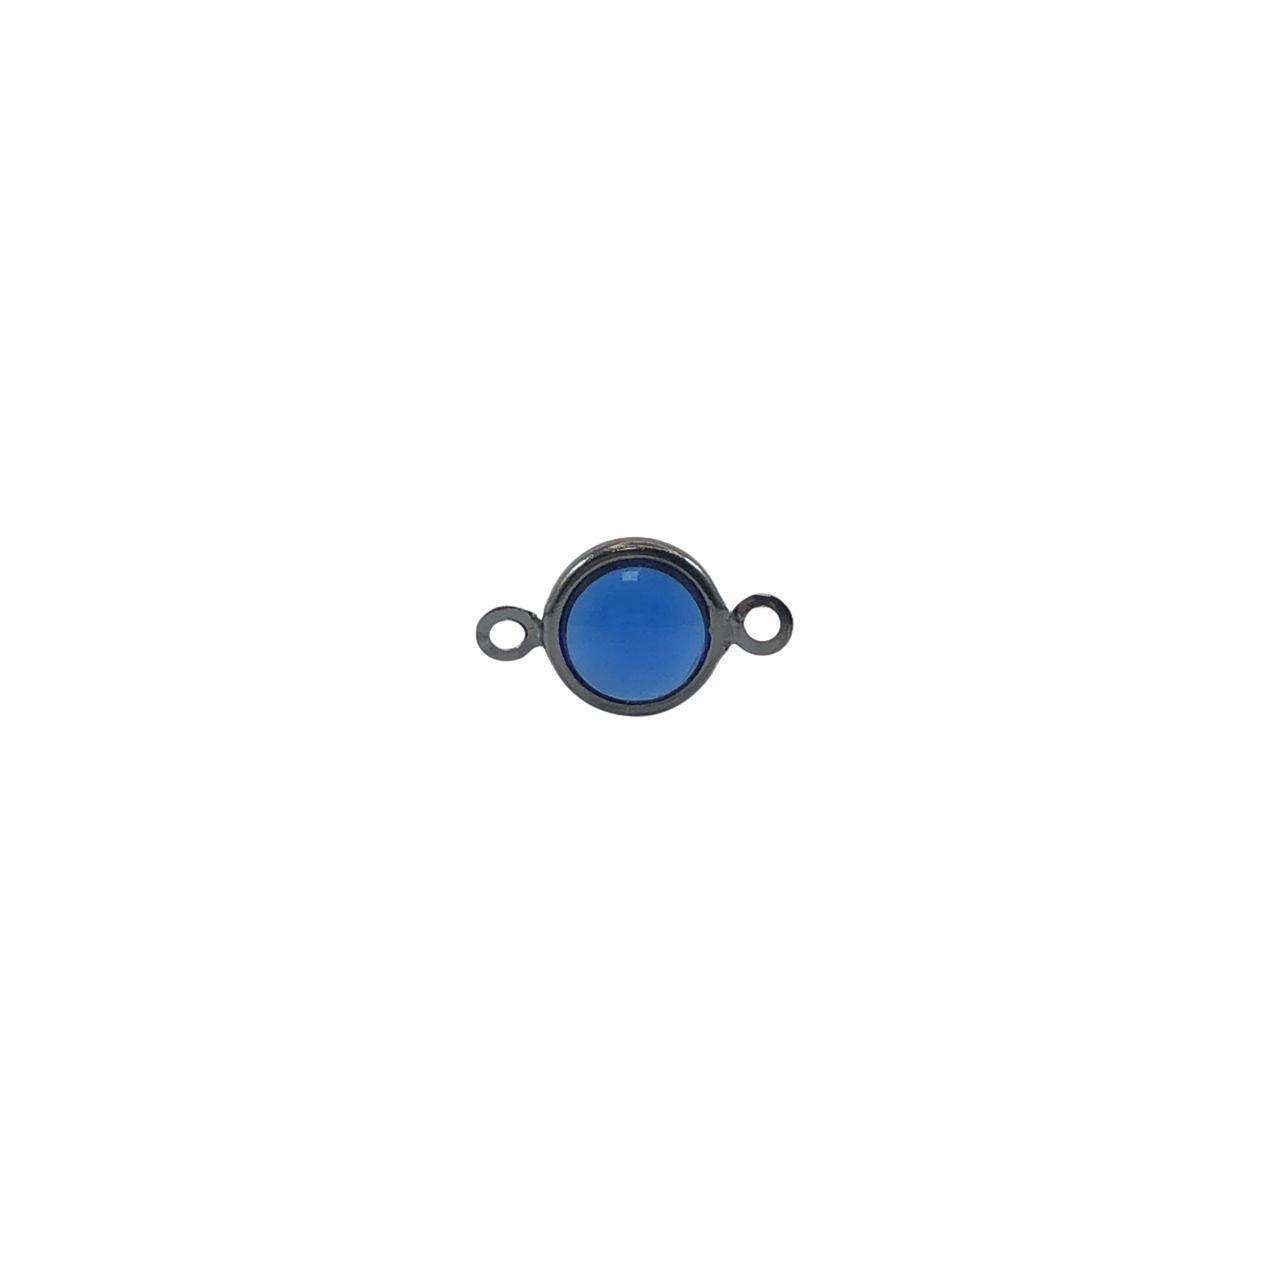 ETM582 - Entremeio De Vidro Sapphire 8mm Banhado Cor Grafite - 4Unids